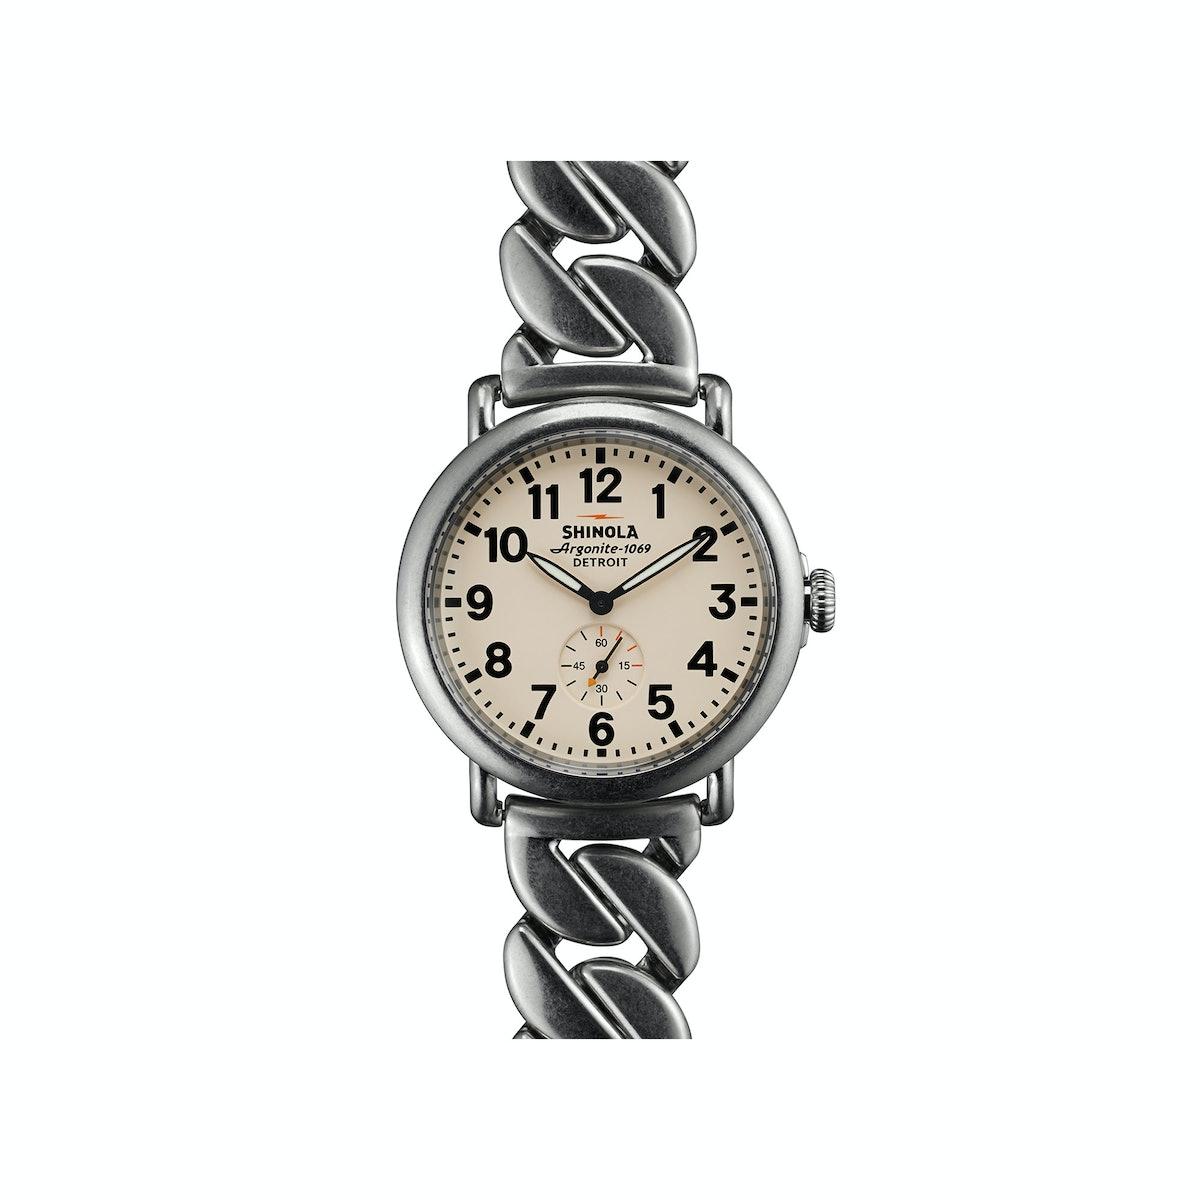 Shinola stainless steel link watch